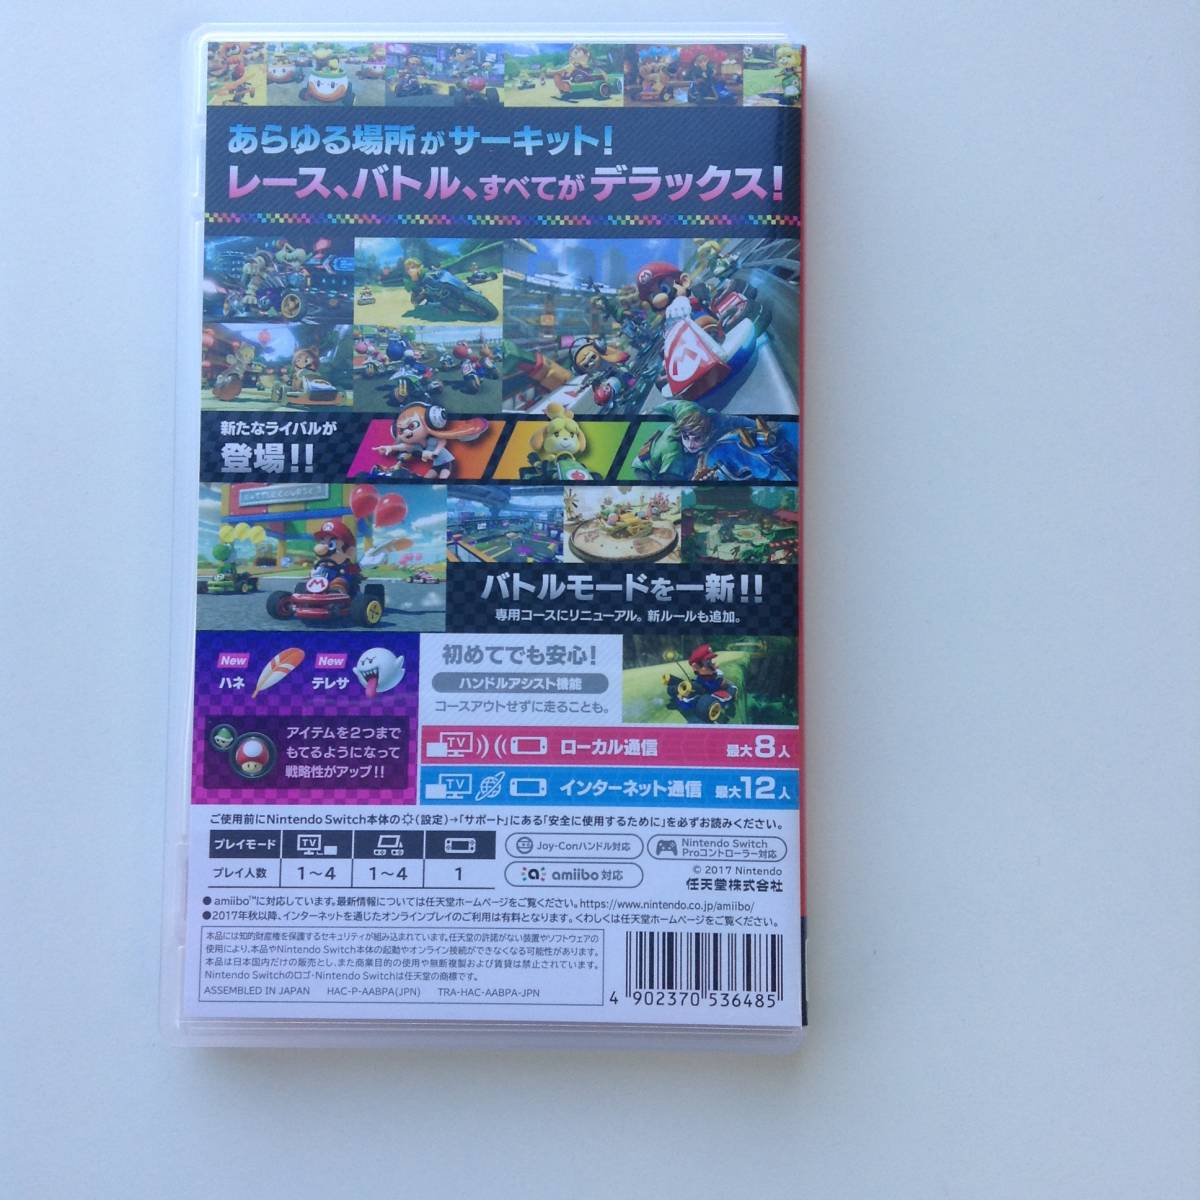 Nintendo Switch マリオカート8デラックス AN2019112602_画像2